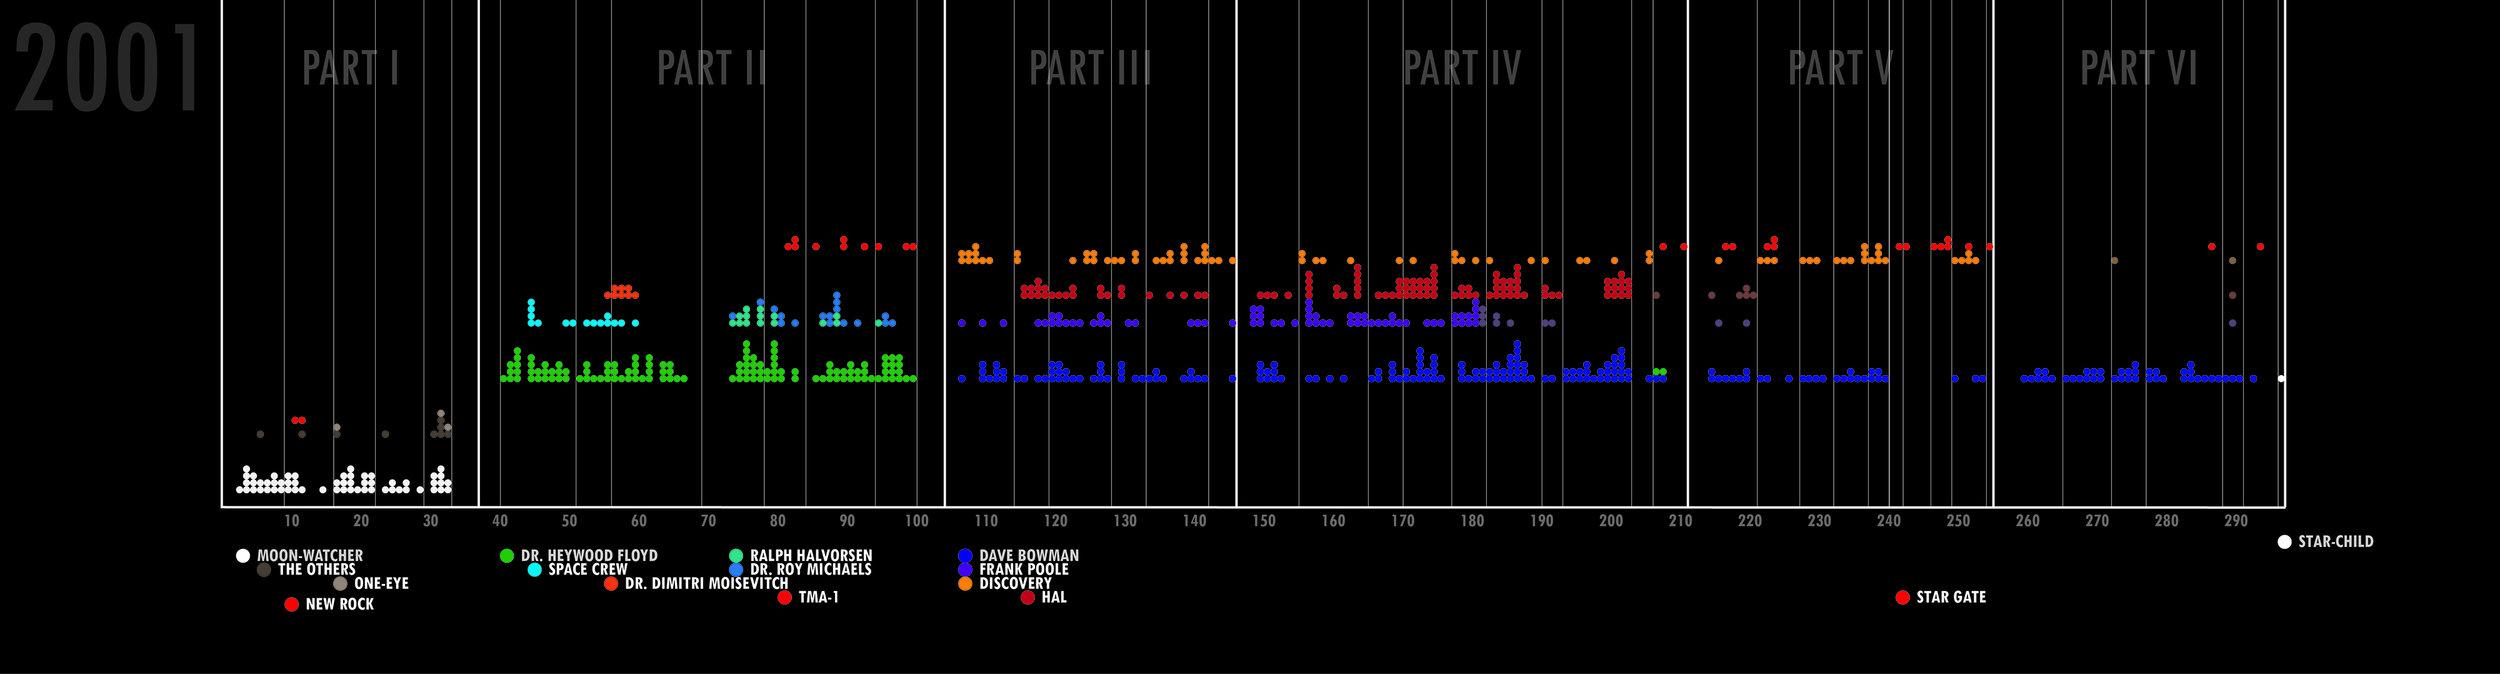 2001 Timeline.jpg